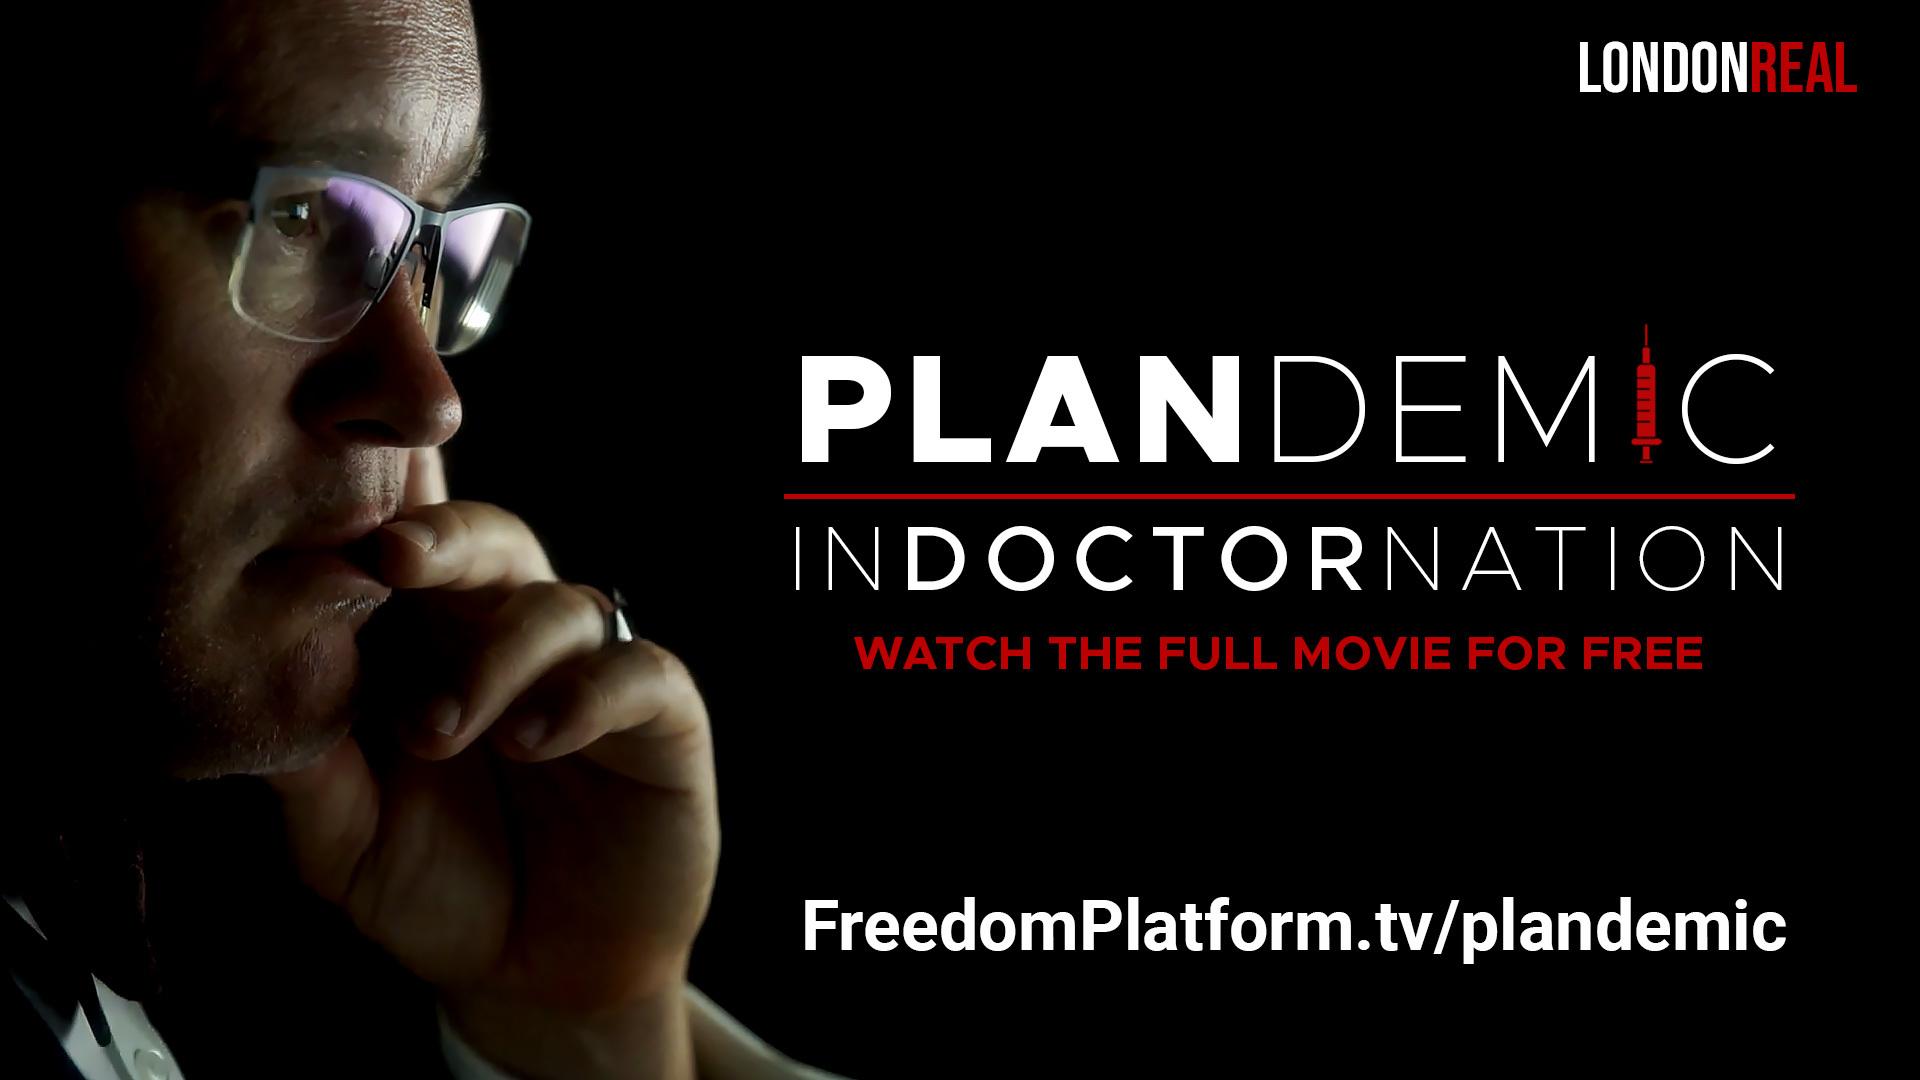 freedomplatform.tv